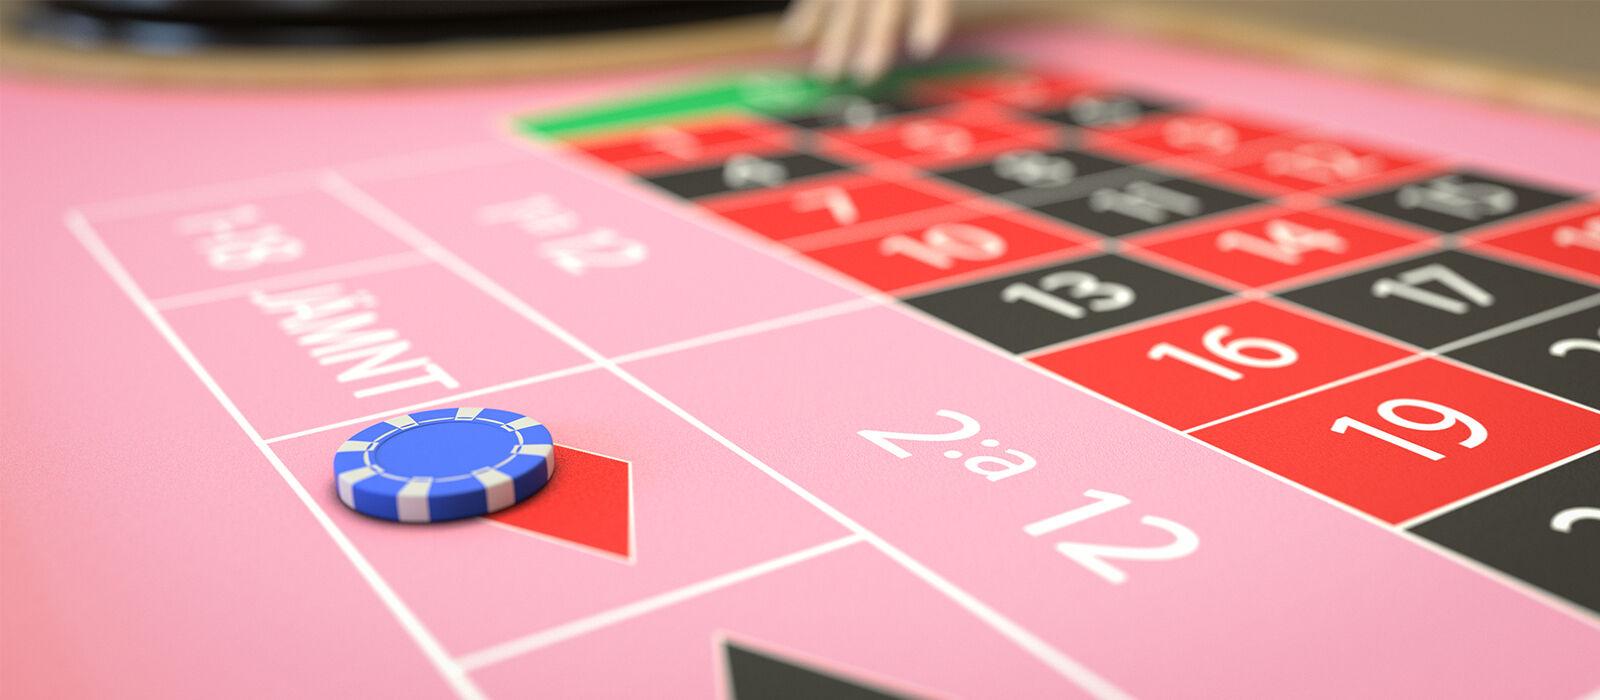 Dras slumpmässigt Folkeautomaten casino 53173